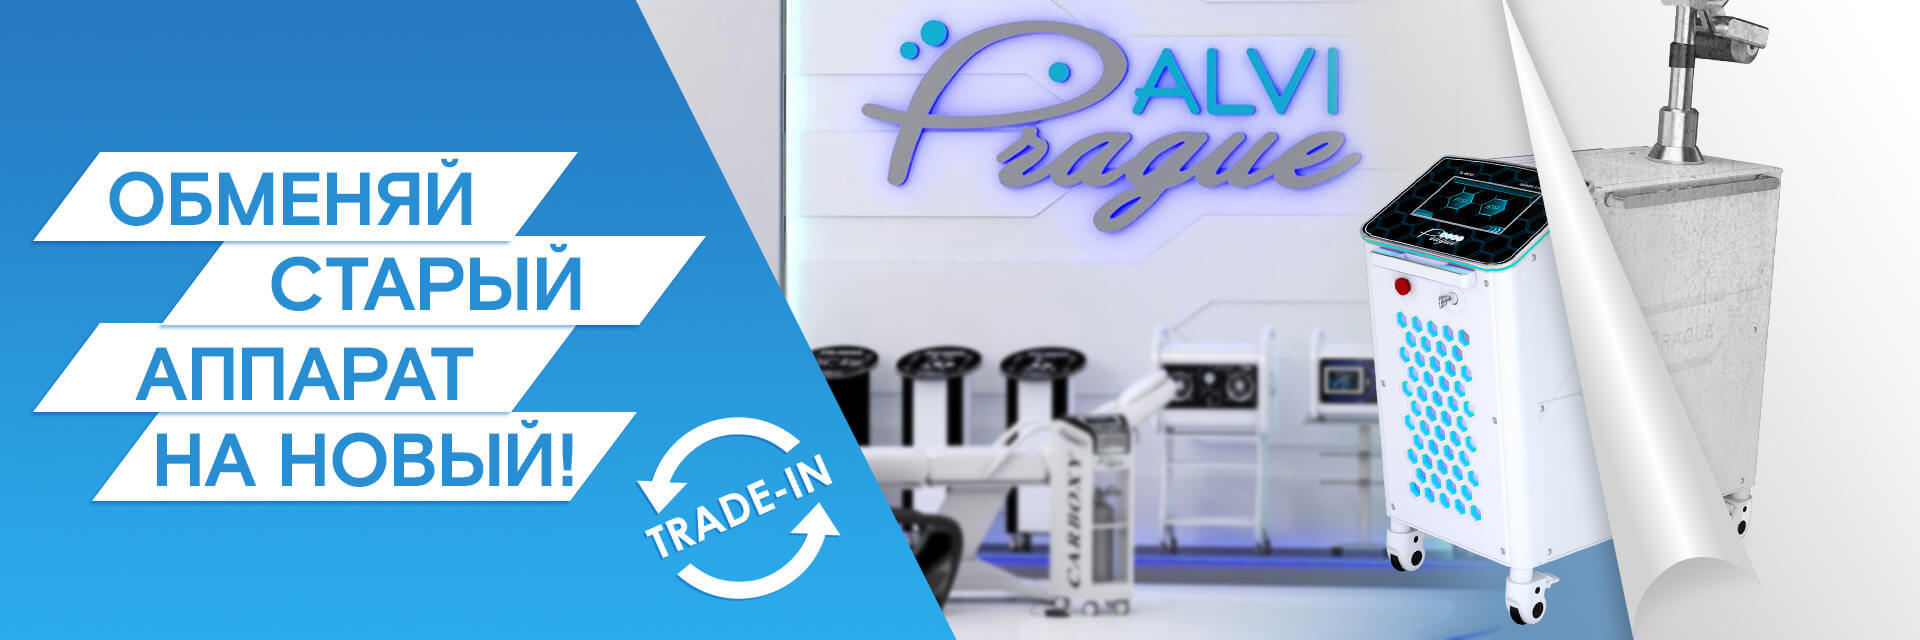 Программа обмена Trade In от Alvi Prague